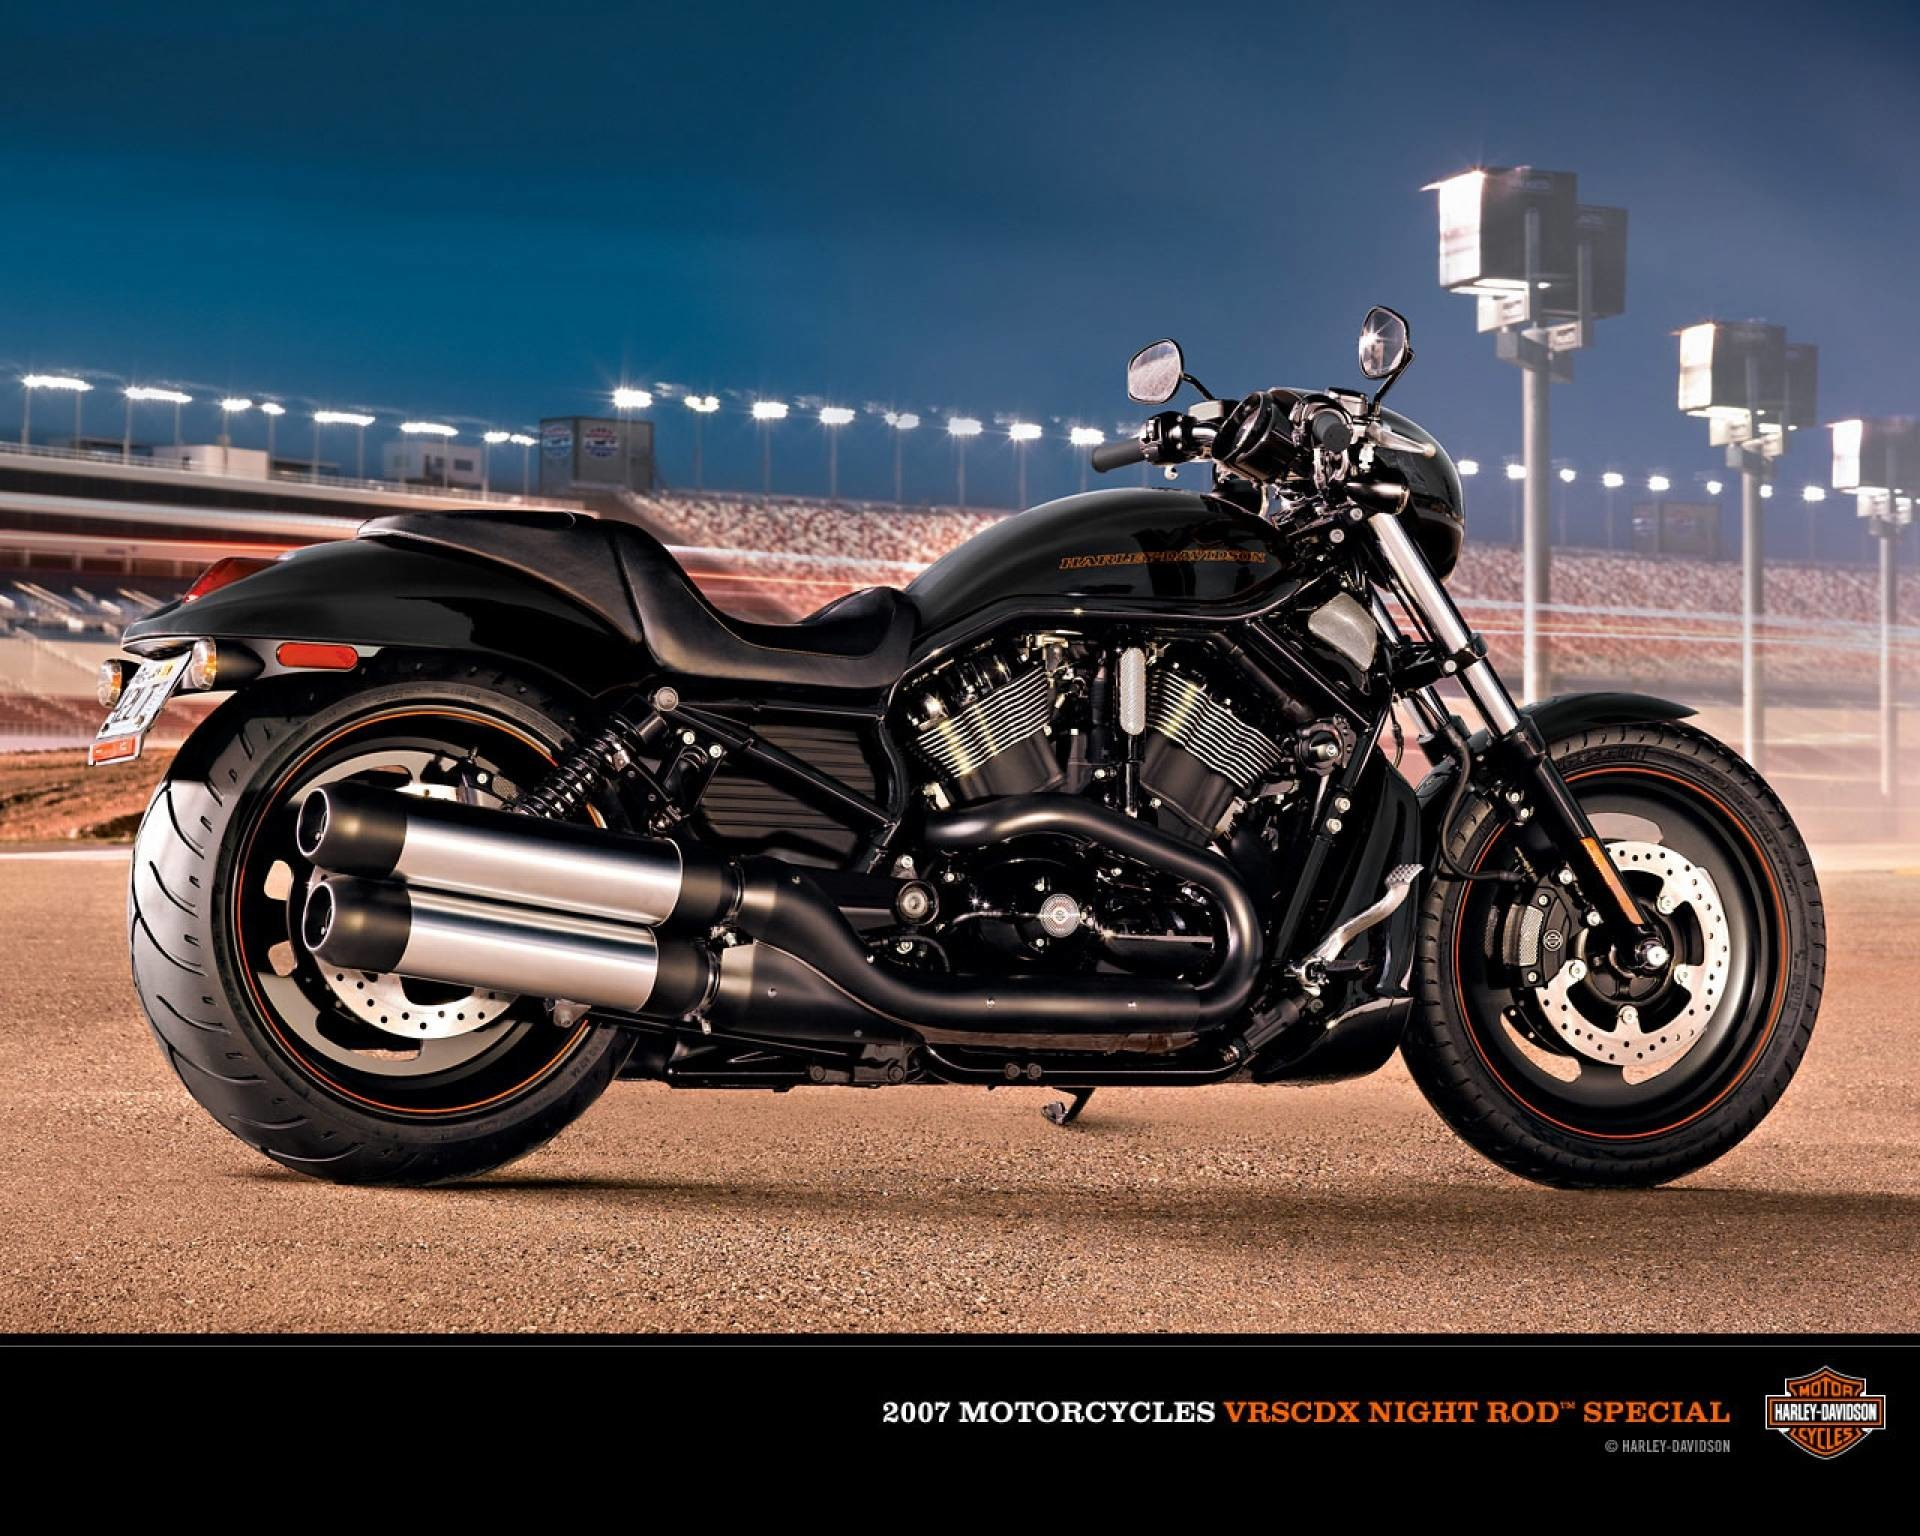 1920x1536 Harley Davidson Bikes Wallpapers Hd 2012 7